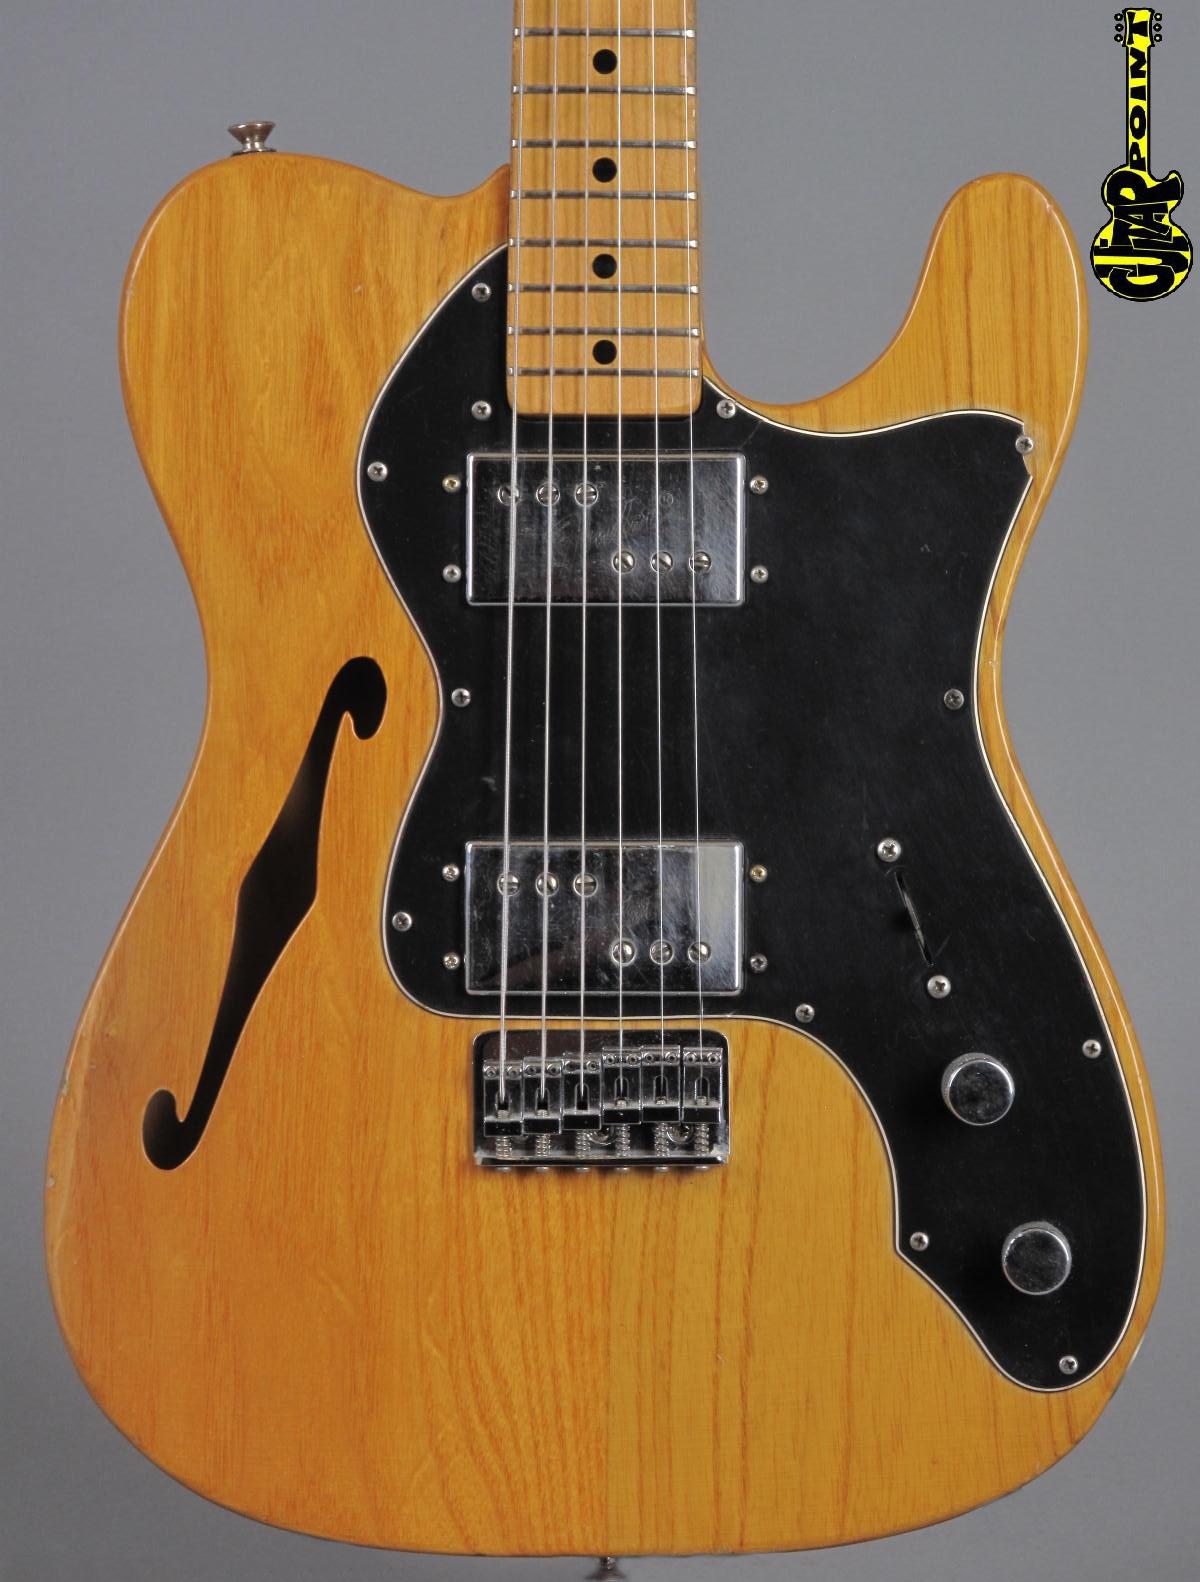 1975 Fender Telecaster Thinline II - Natural